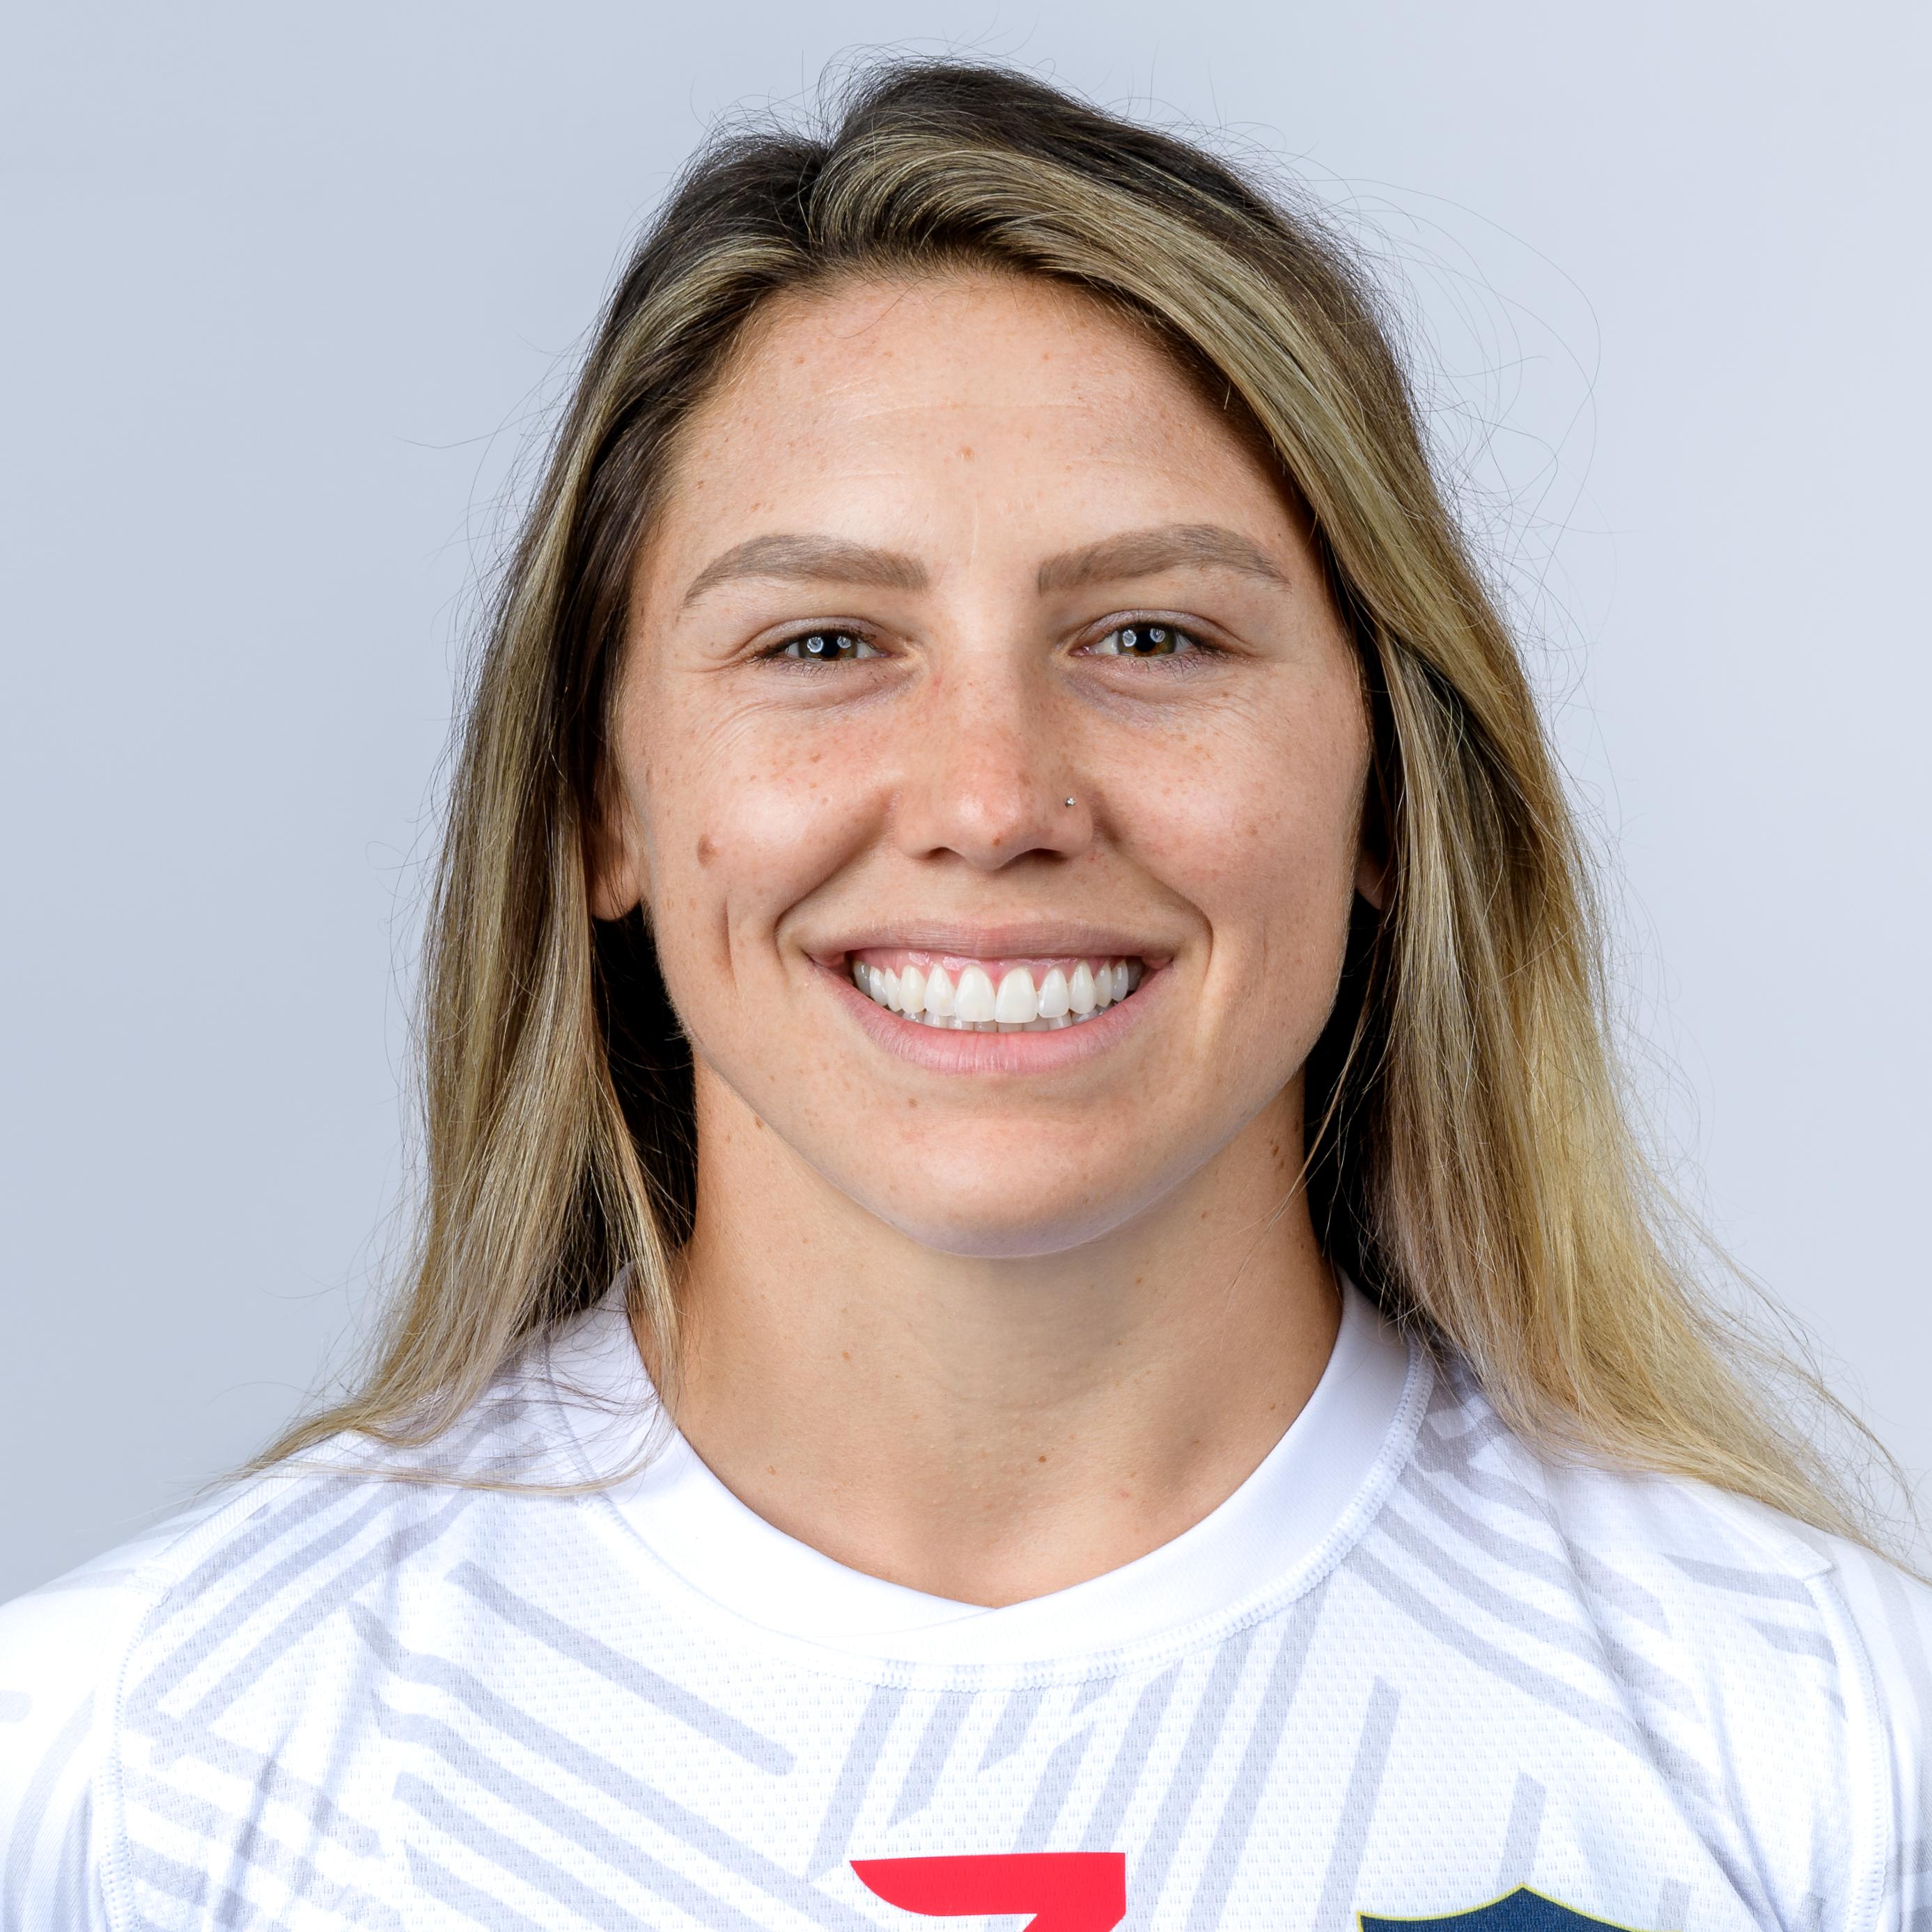 Abby Gustaitis